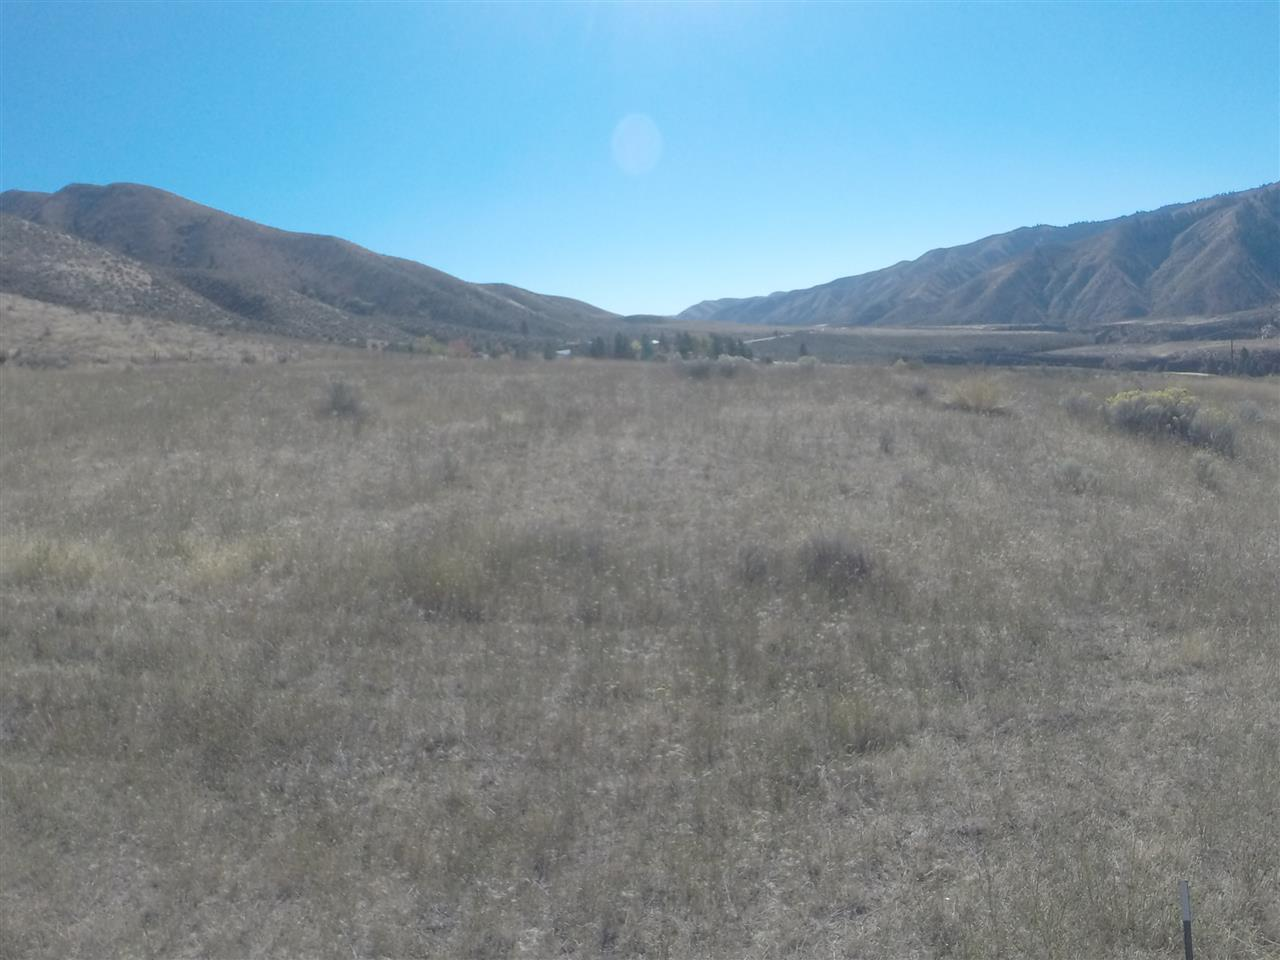 21 Highway 21, Boise, ID 83716